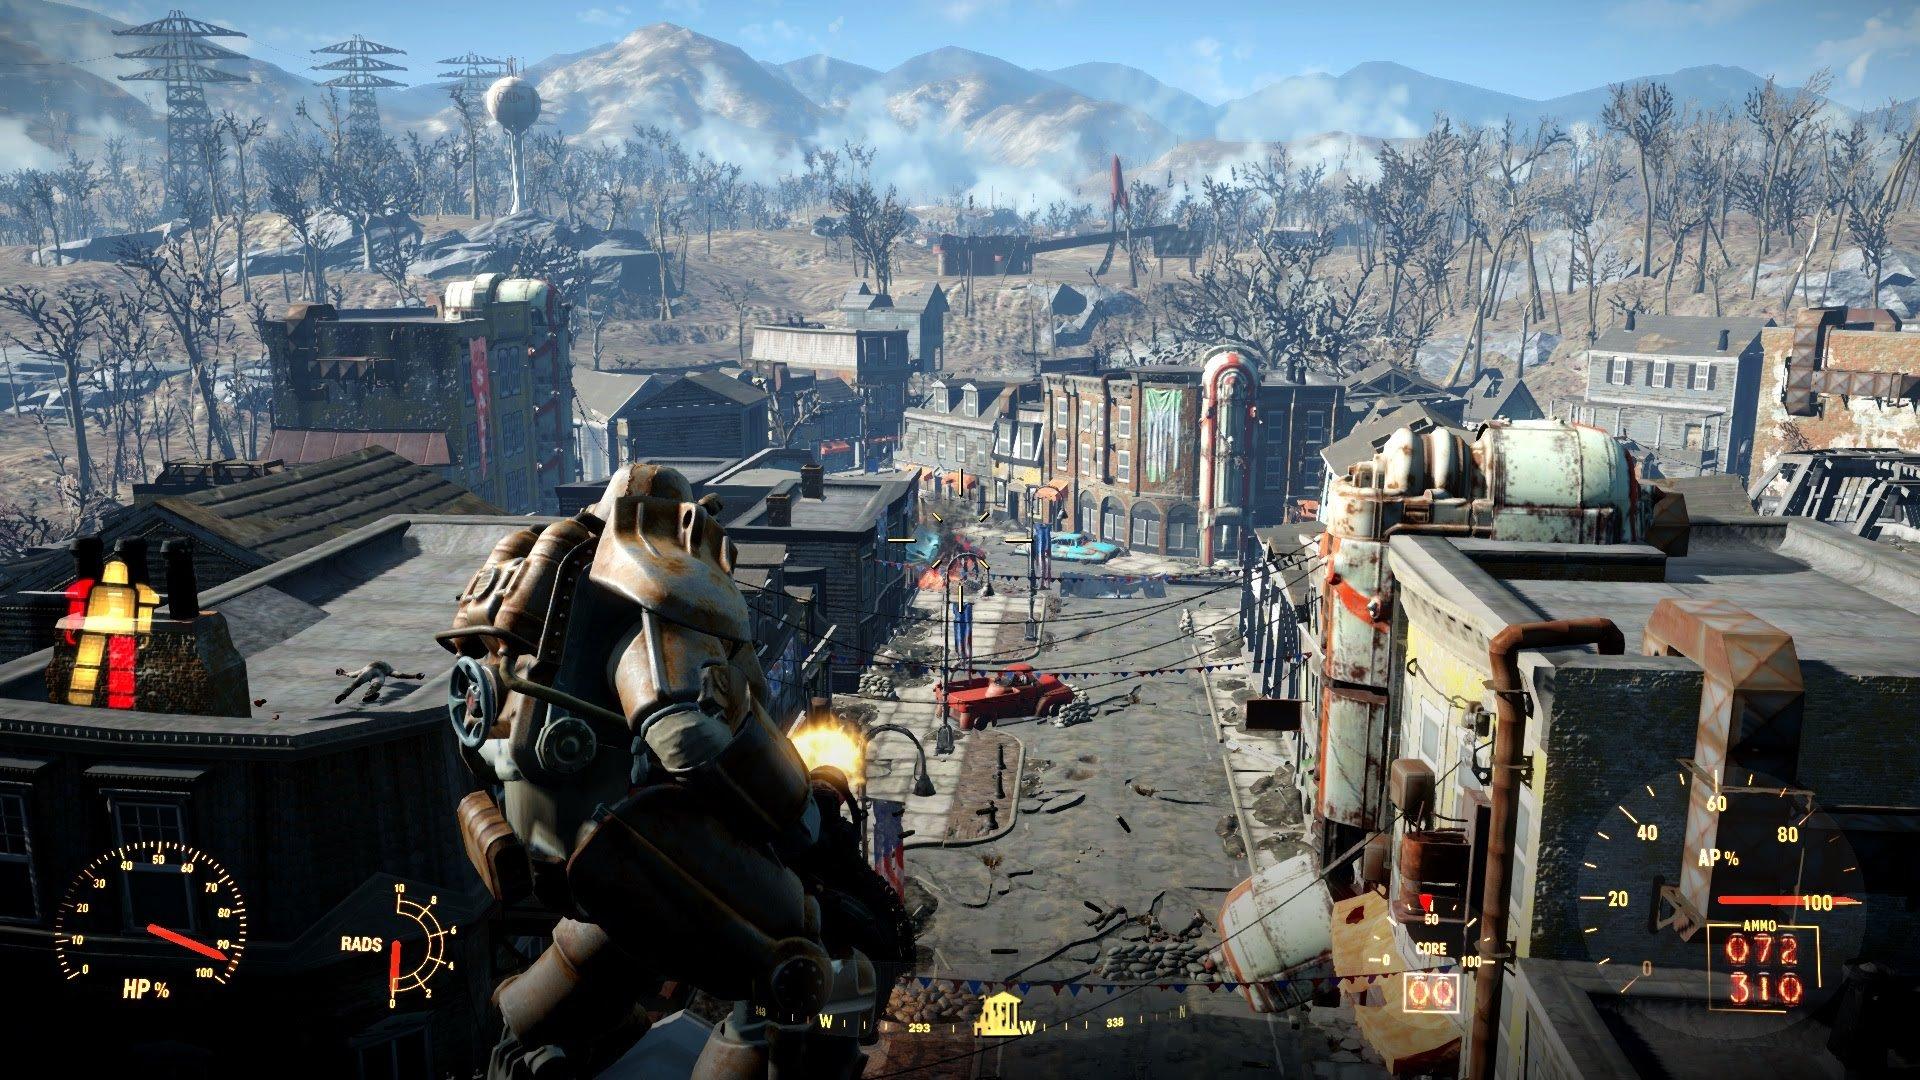 Fallout 4 New Vegas Fallout 76 какая часть fallout лучше